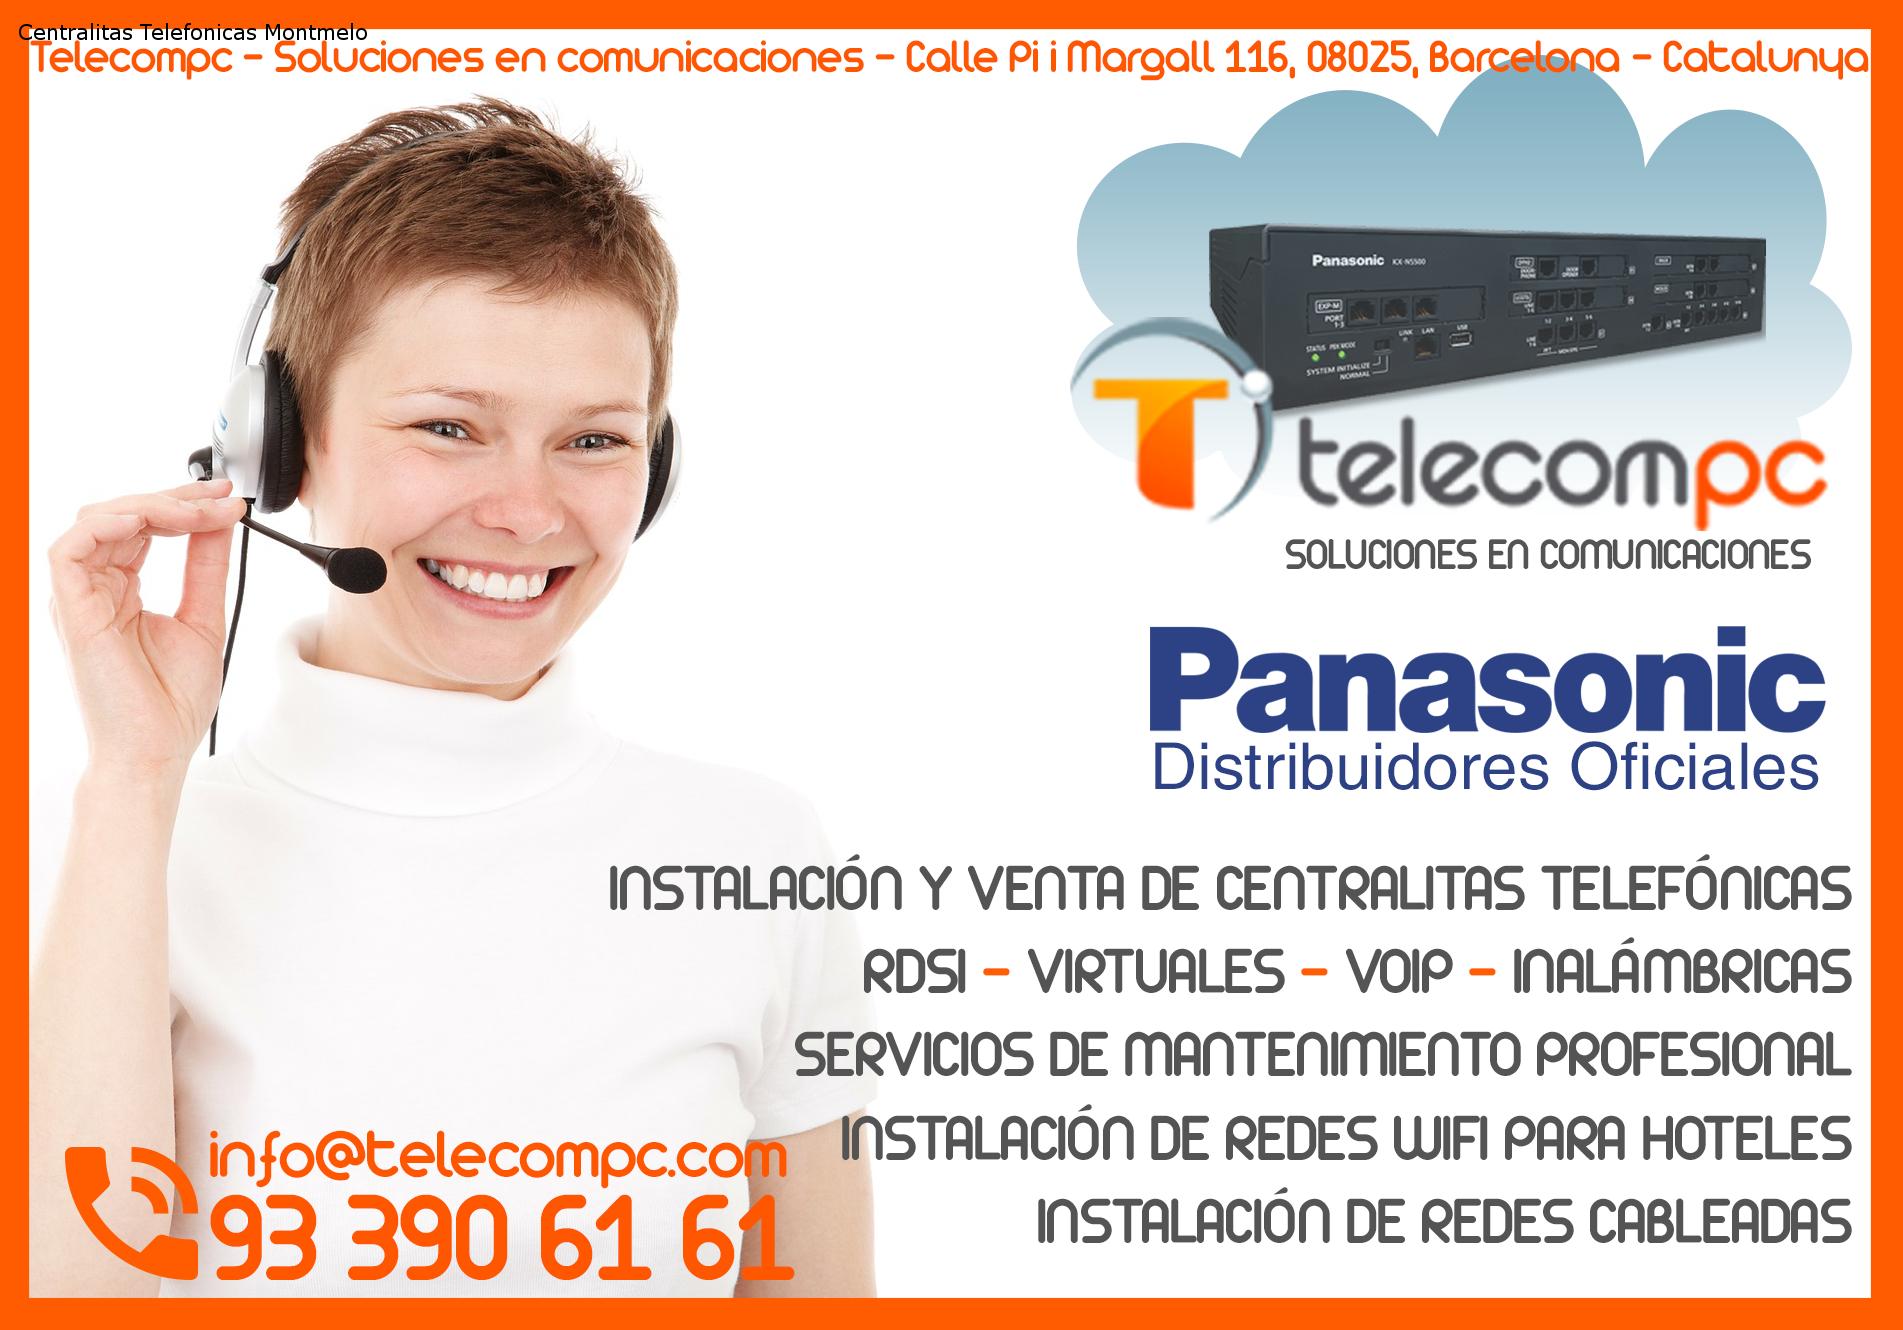 Centralitas Telefonicas Montmelo